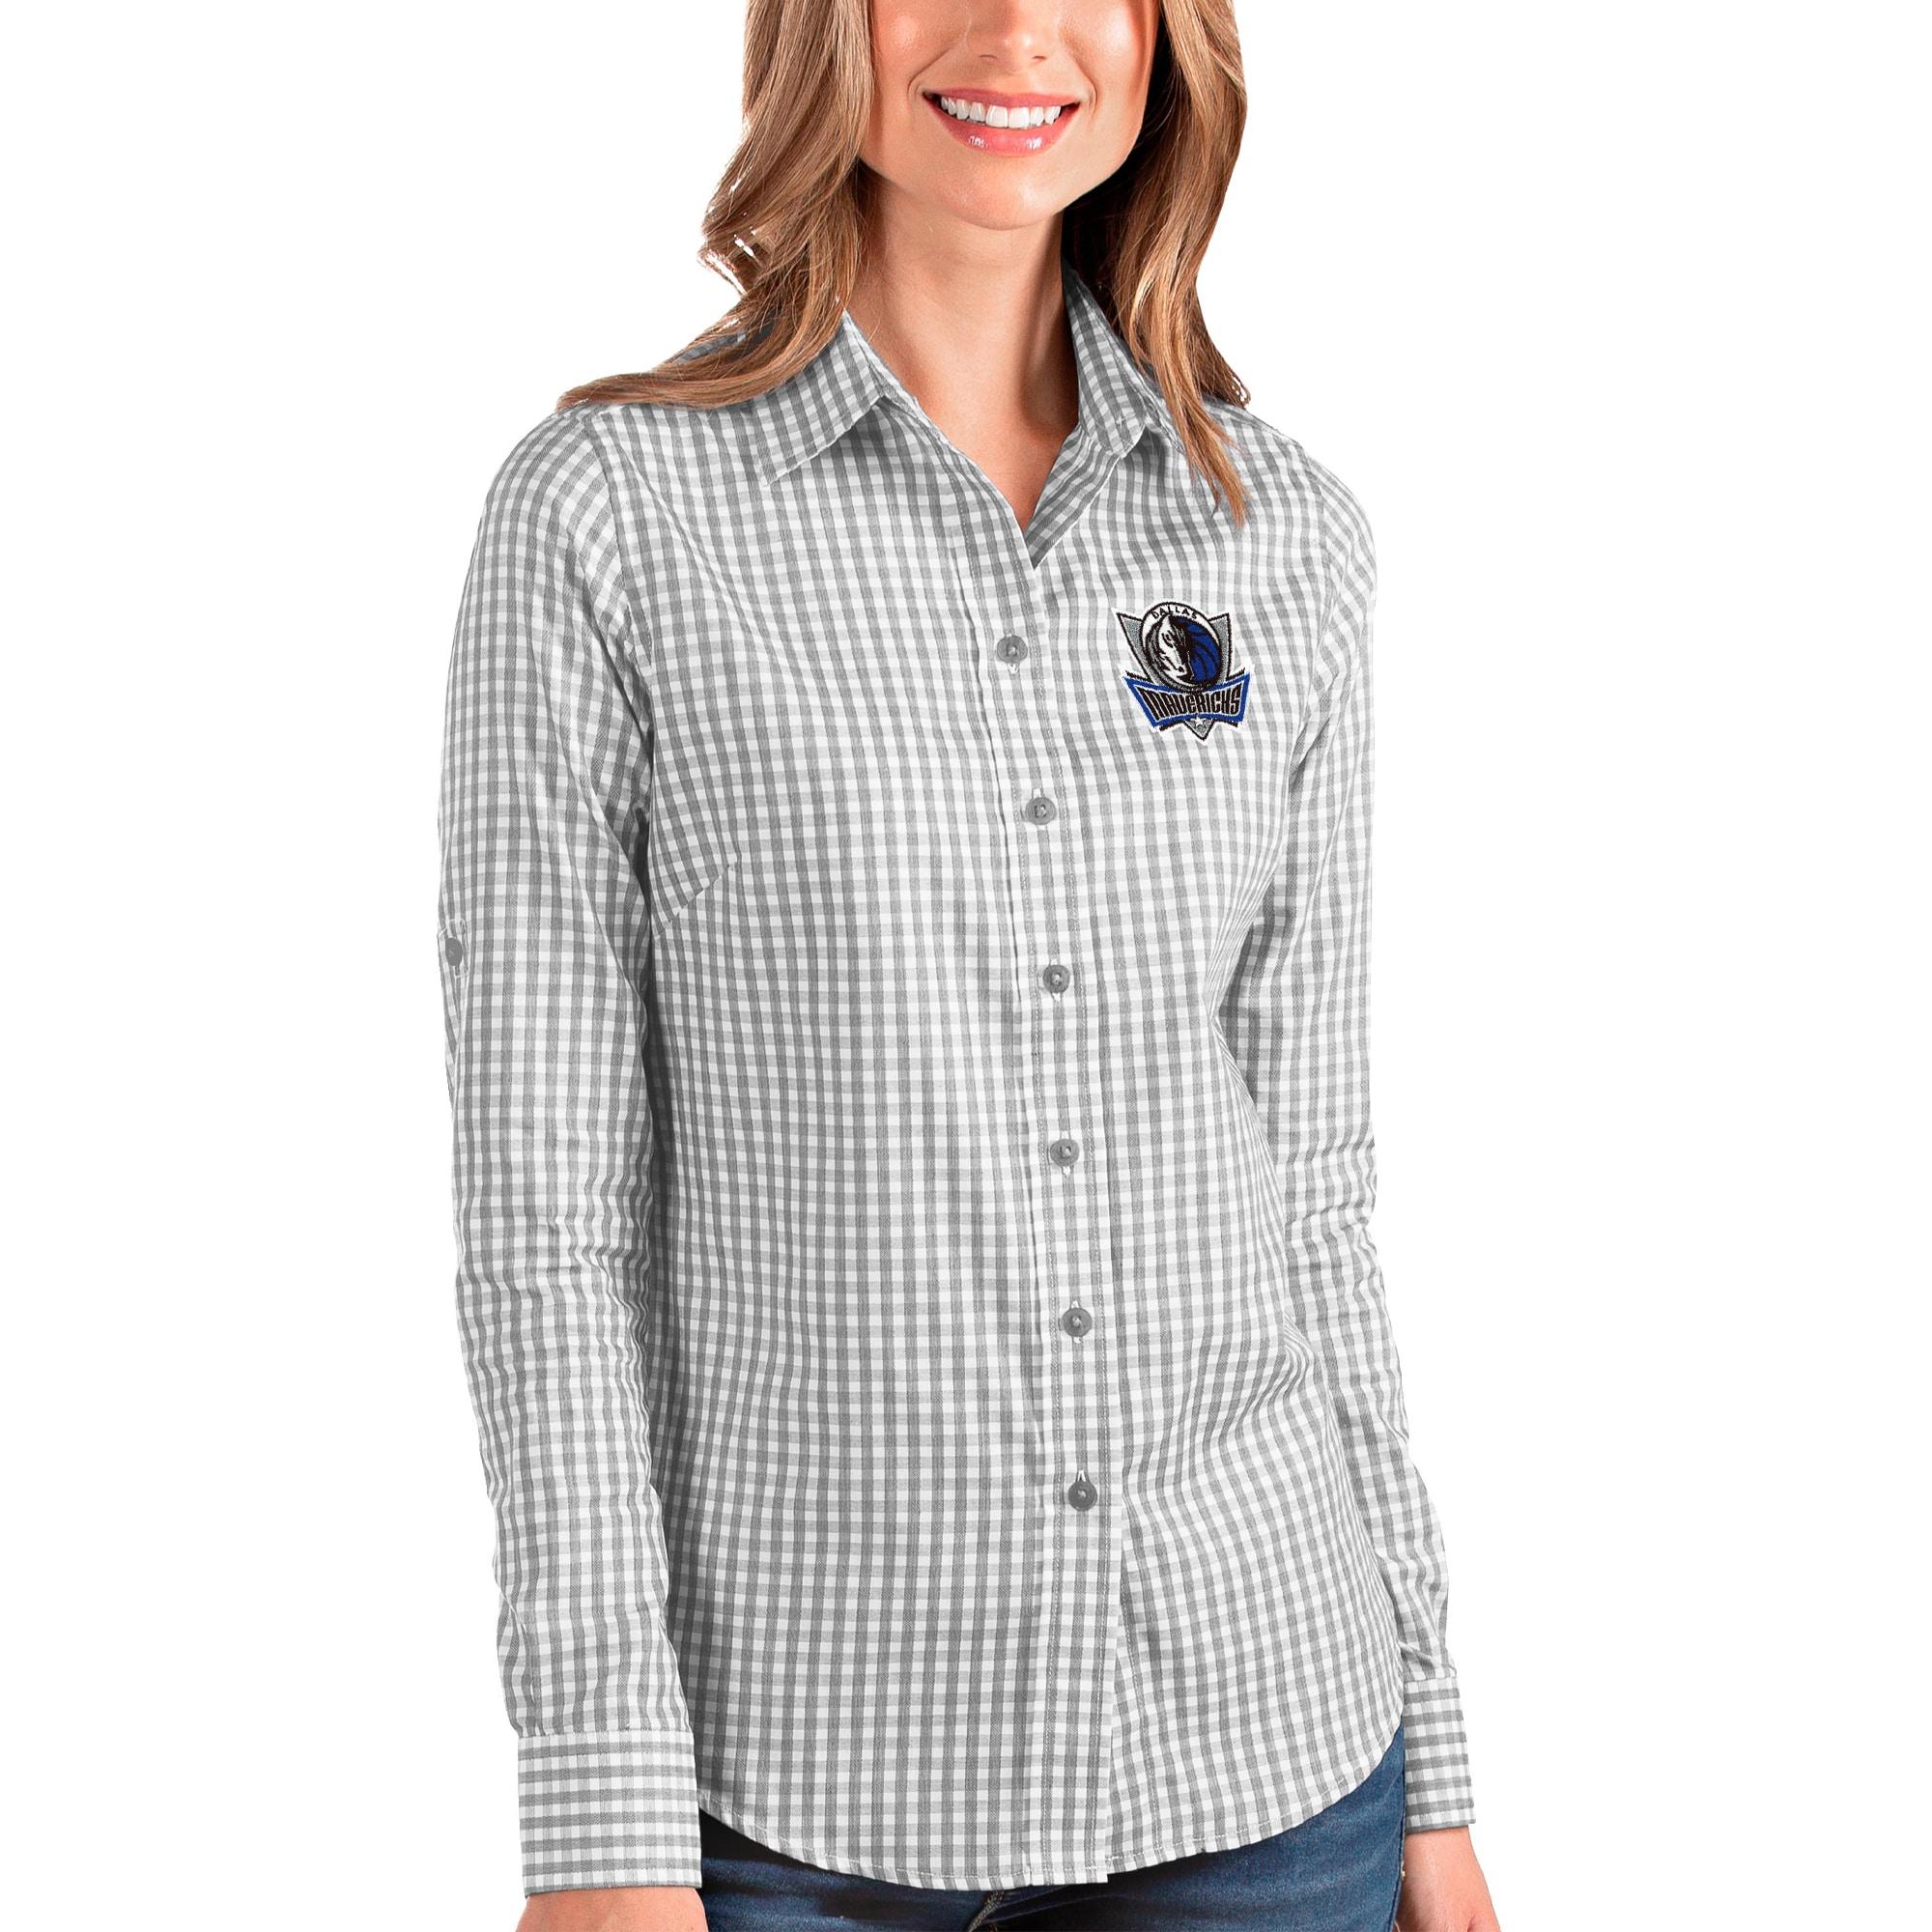 Dallas Mavericks Antigua Women's Structure Button-Up Long Sleeve Shirt - Charcoal/White